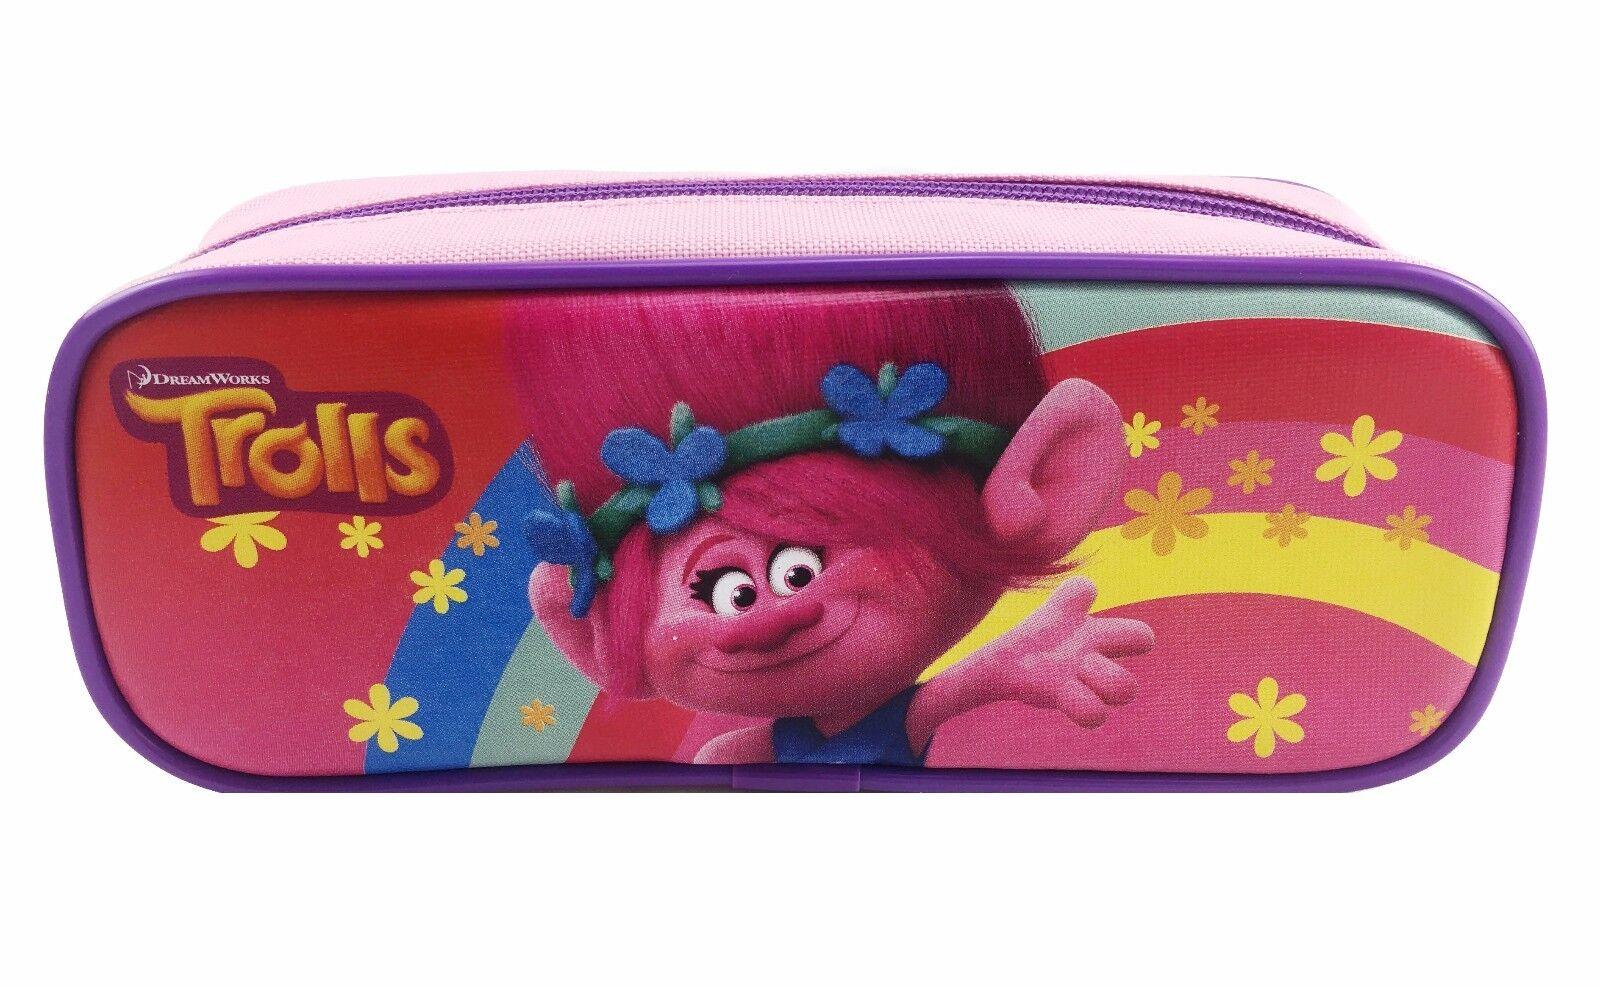 Trolls zipper  pouch